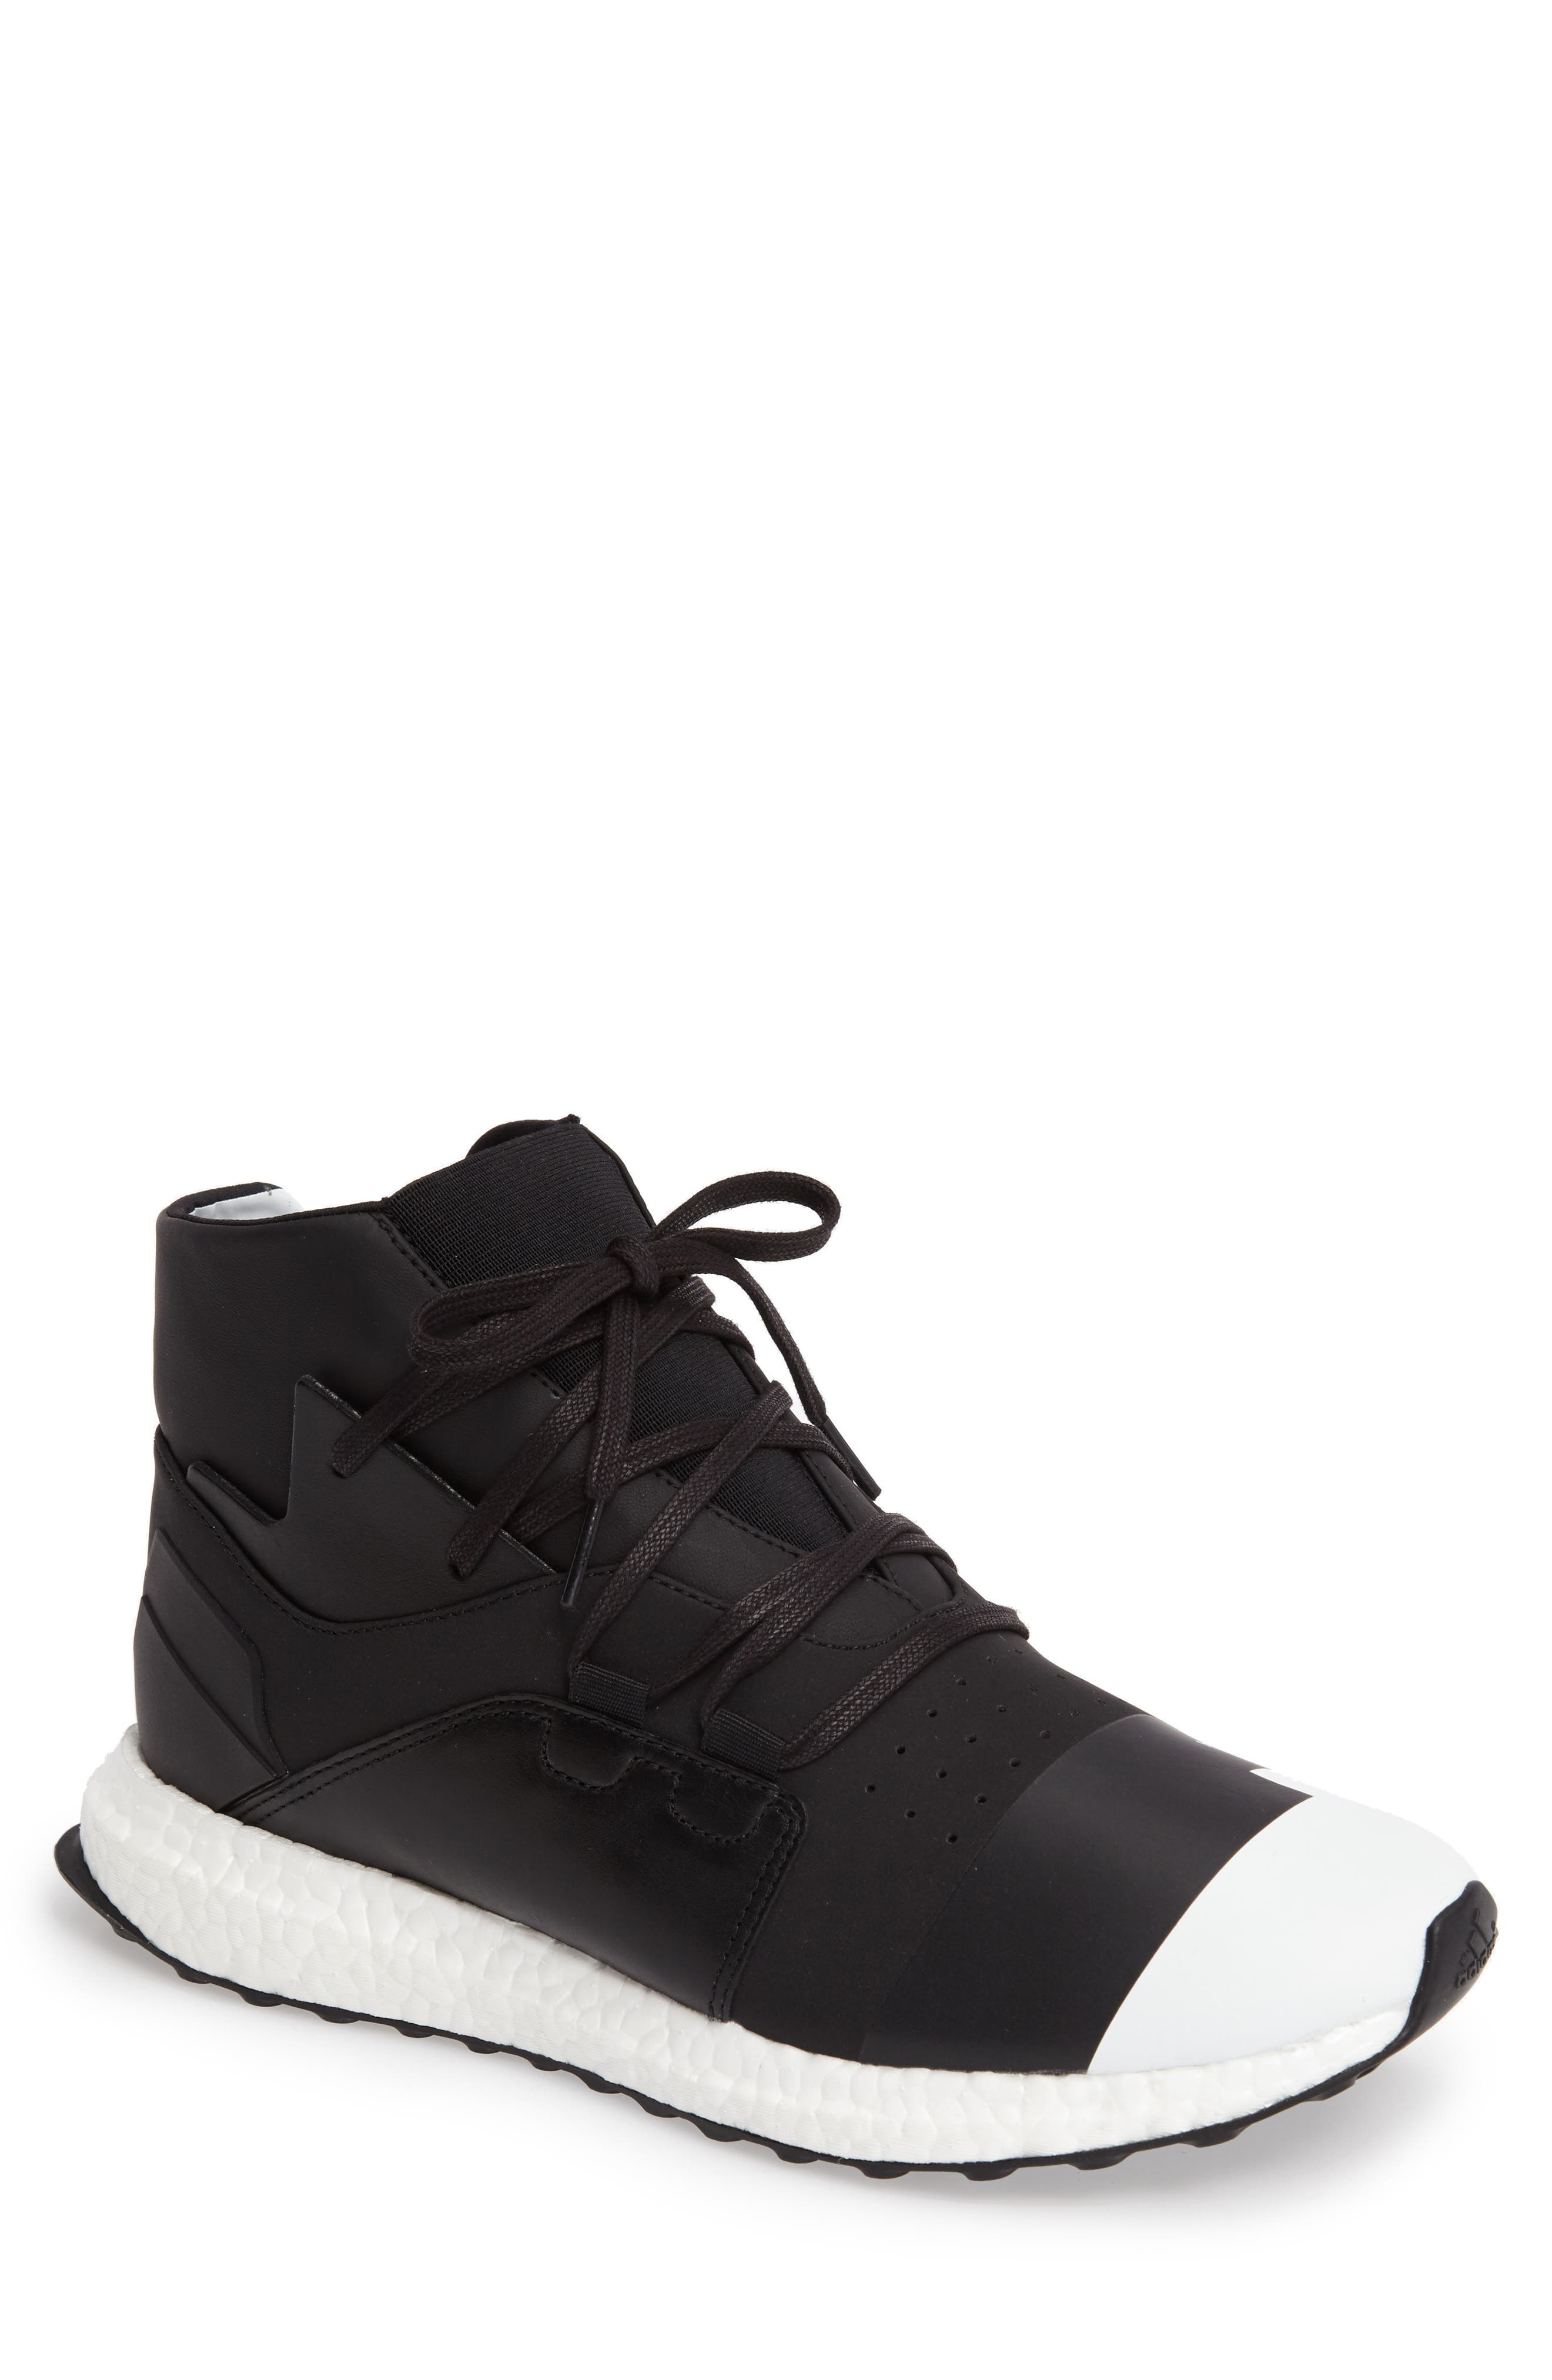 Y-3 Kozoko High Sneaker, Main, color, 001